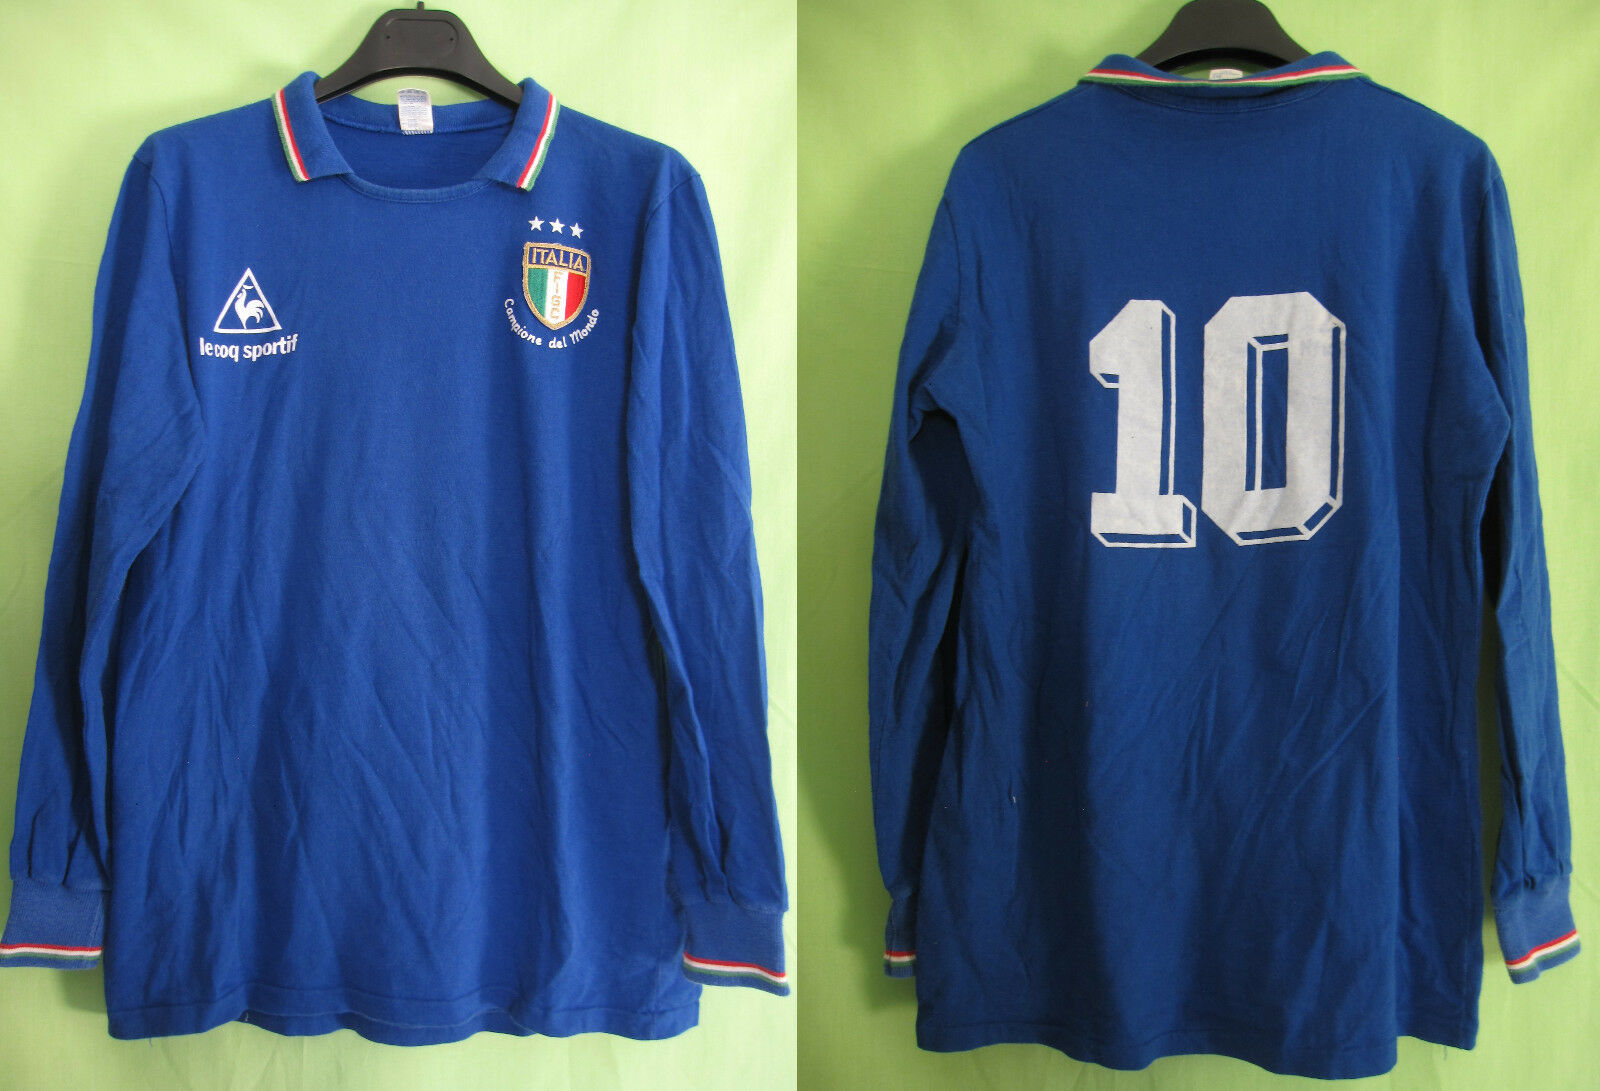 Maillot Le Coq Sportif ITALIE Calcio Match camiseta italia Jersey Vintage - L